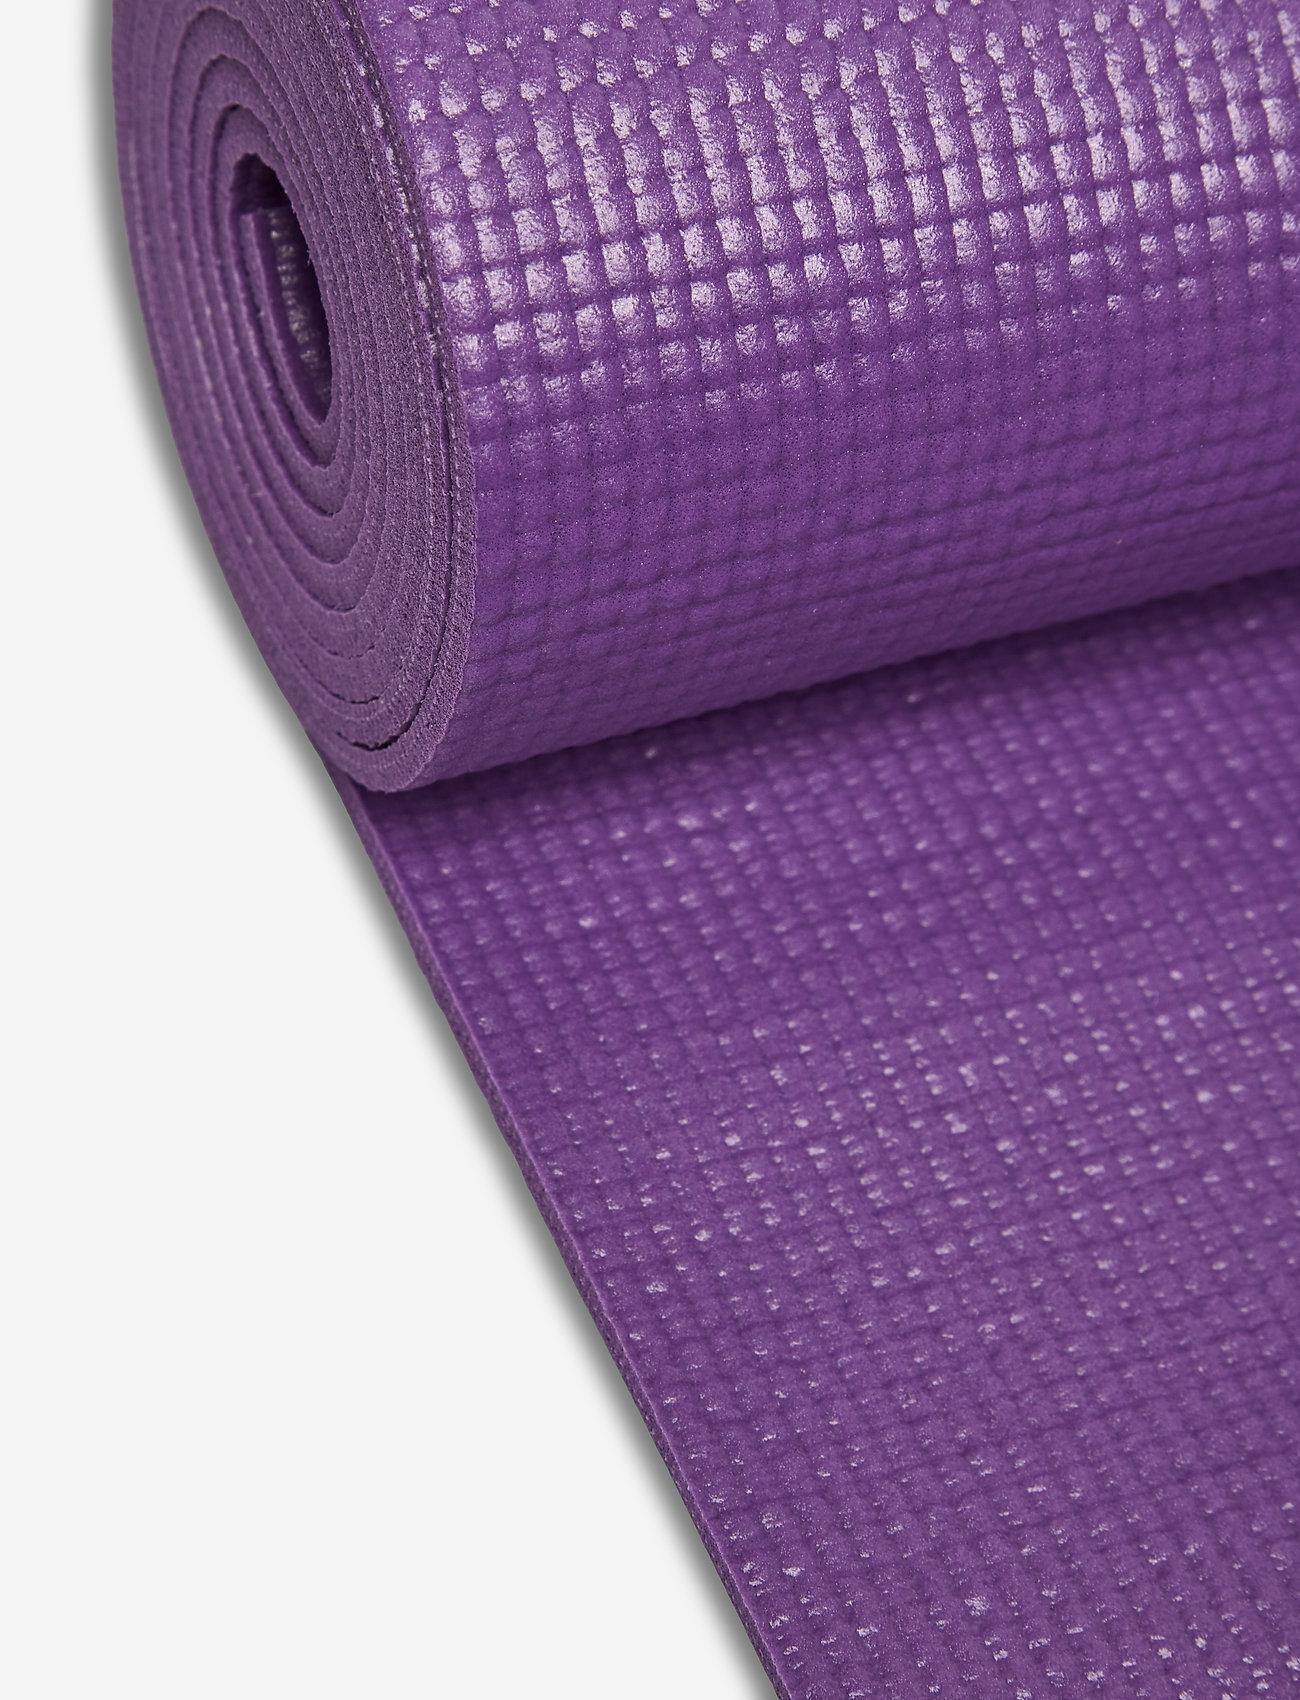 Yogiraj - All-round yoga mat 4 mm - Yogiraj - yogamatten en -accessoires - lilac purple - 1